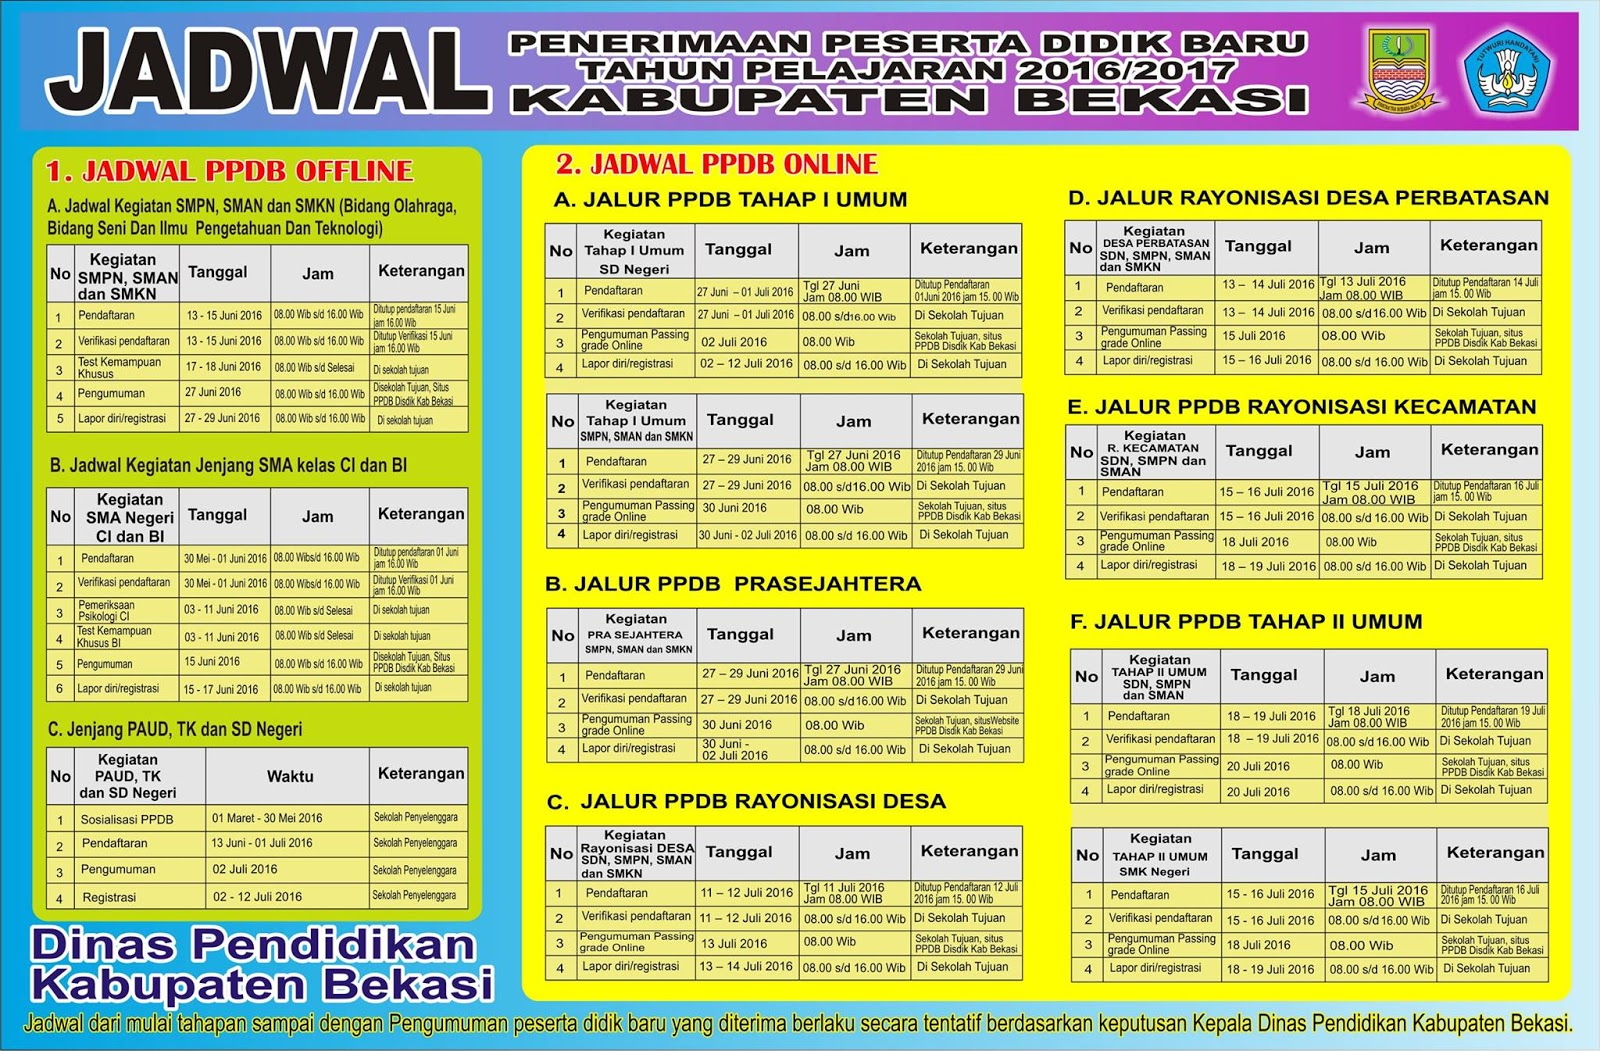 Bang Imam Berbagi: Jadwal PPDB Online Kabupaten Bekasi 2016